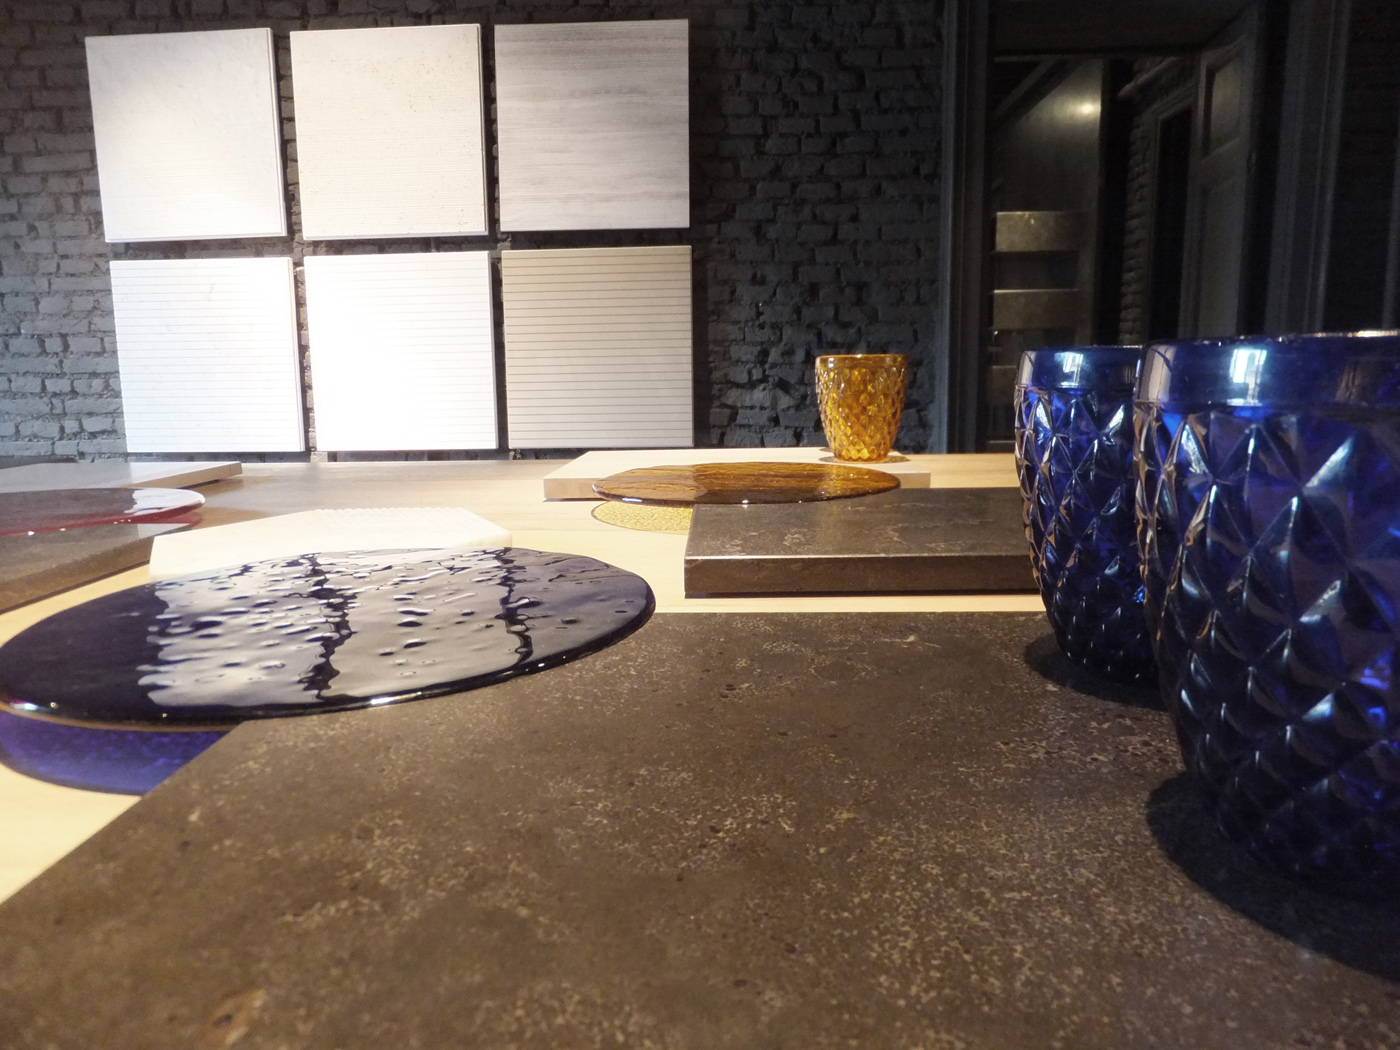 08_Salvatori_marmo_Plat-eau glass_Silvia Fanticelli